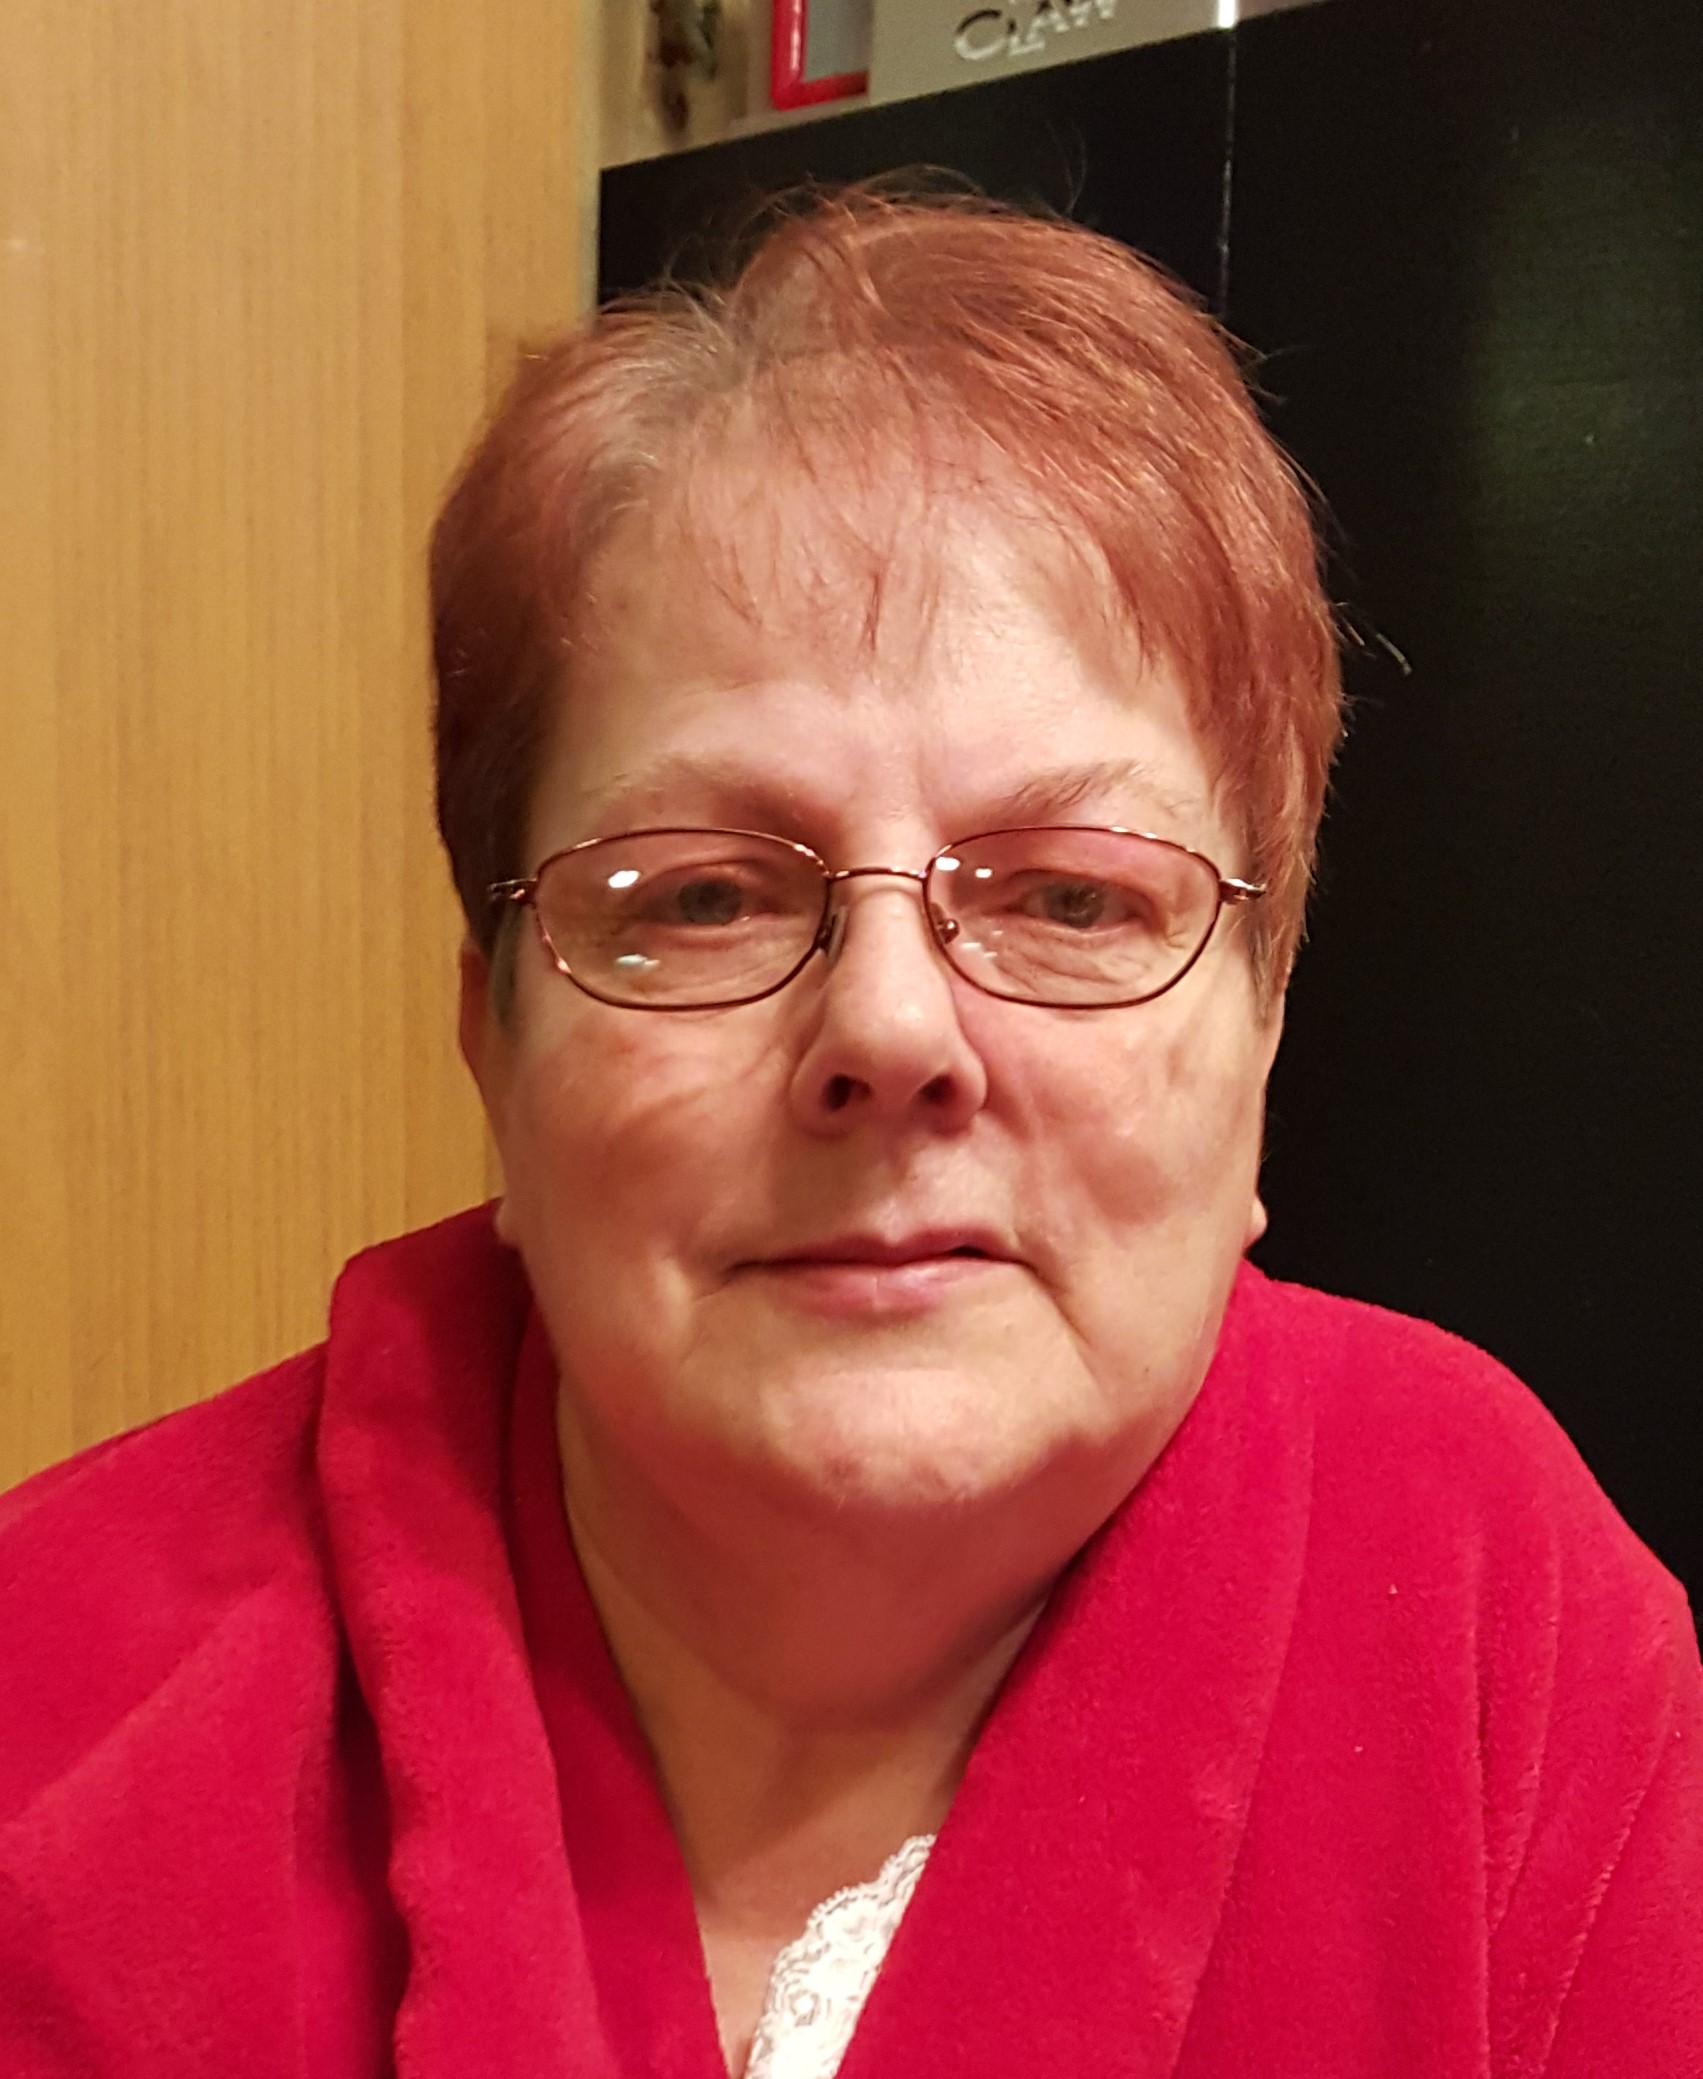 JANET DIXON